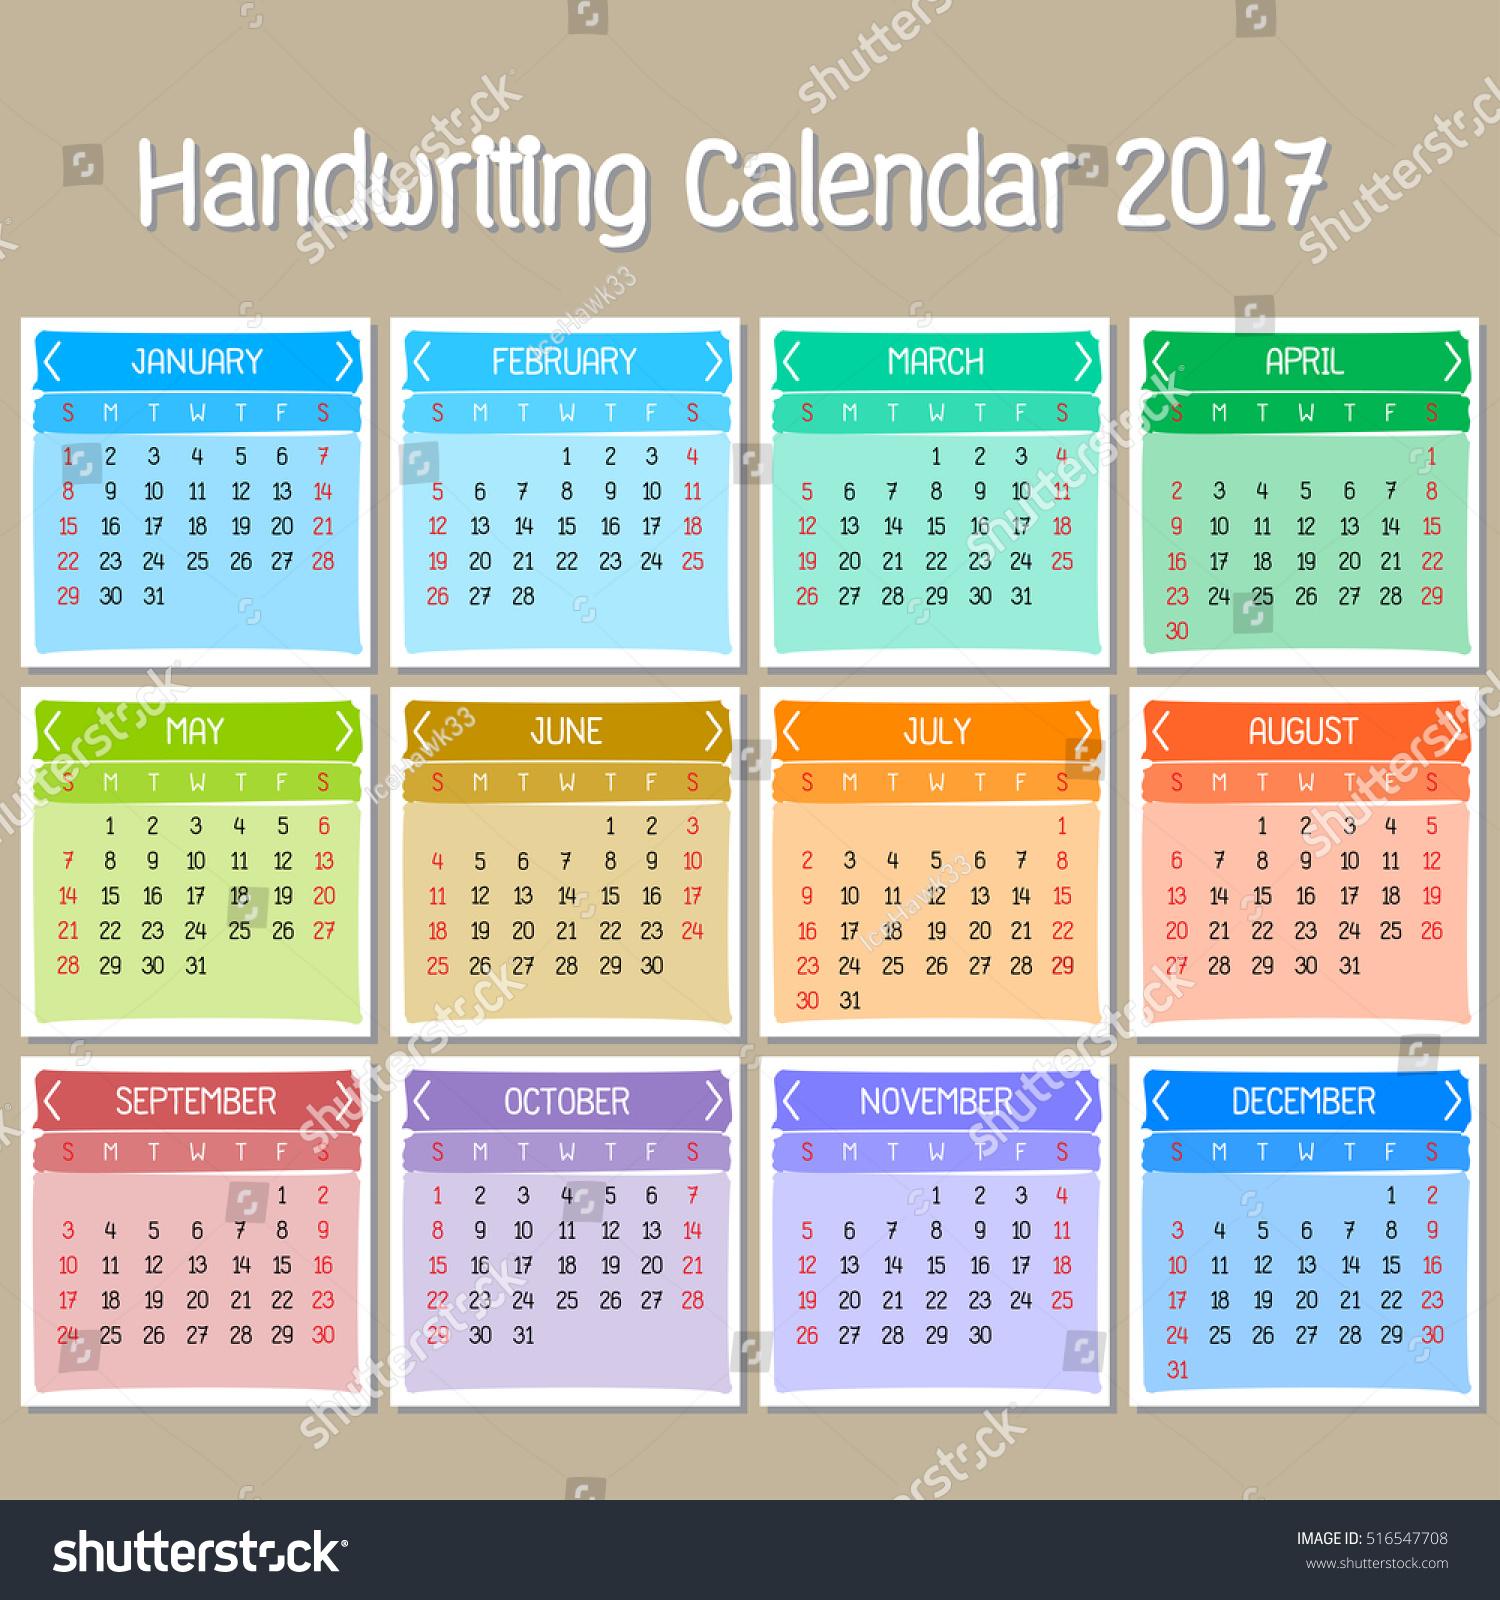 Cute Calendar Illustration : Basic handwriting calendar cute vector stock